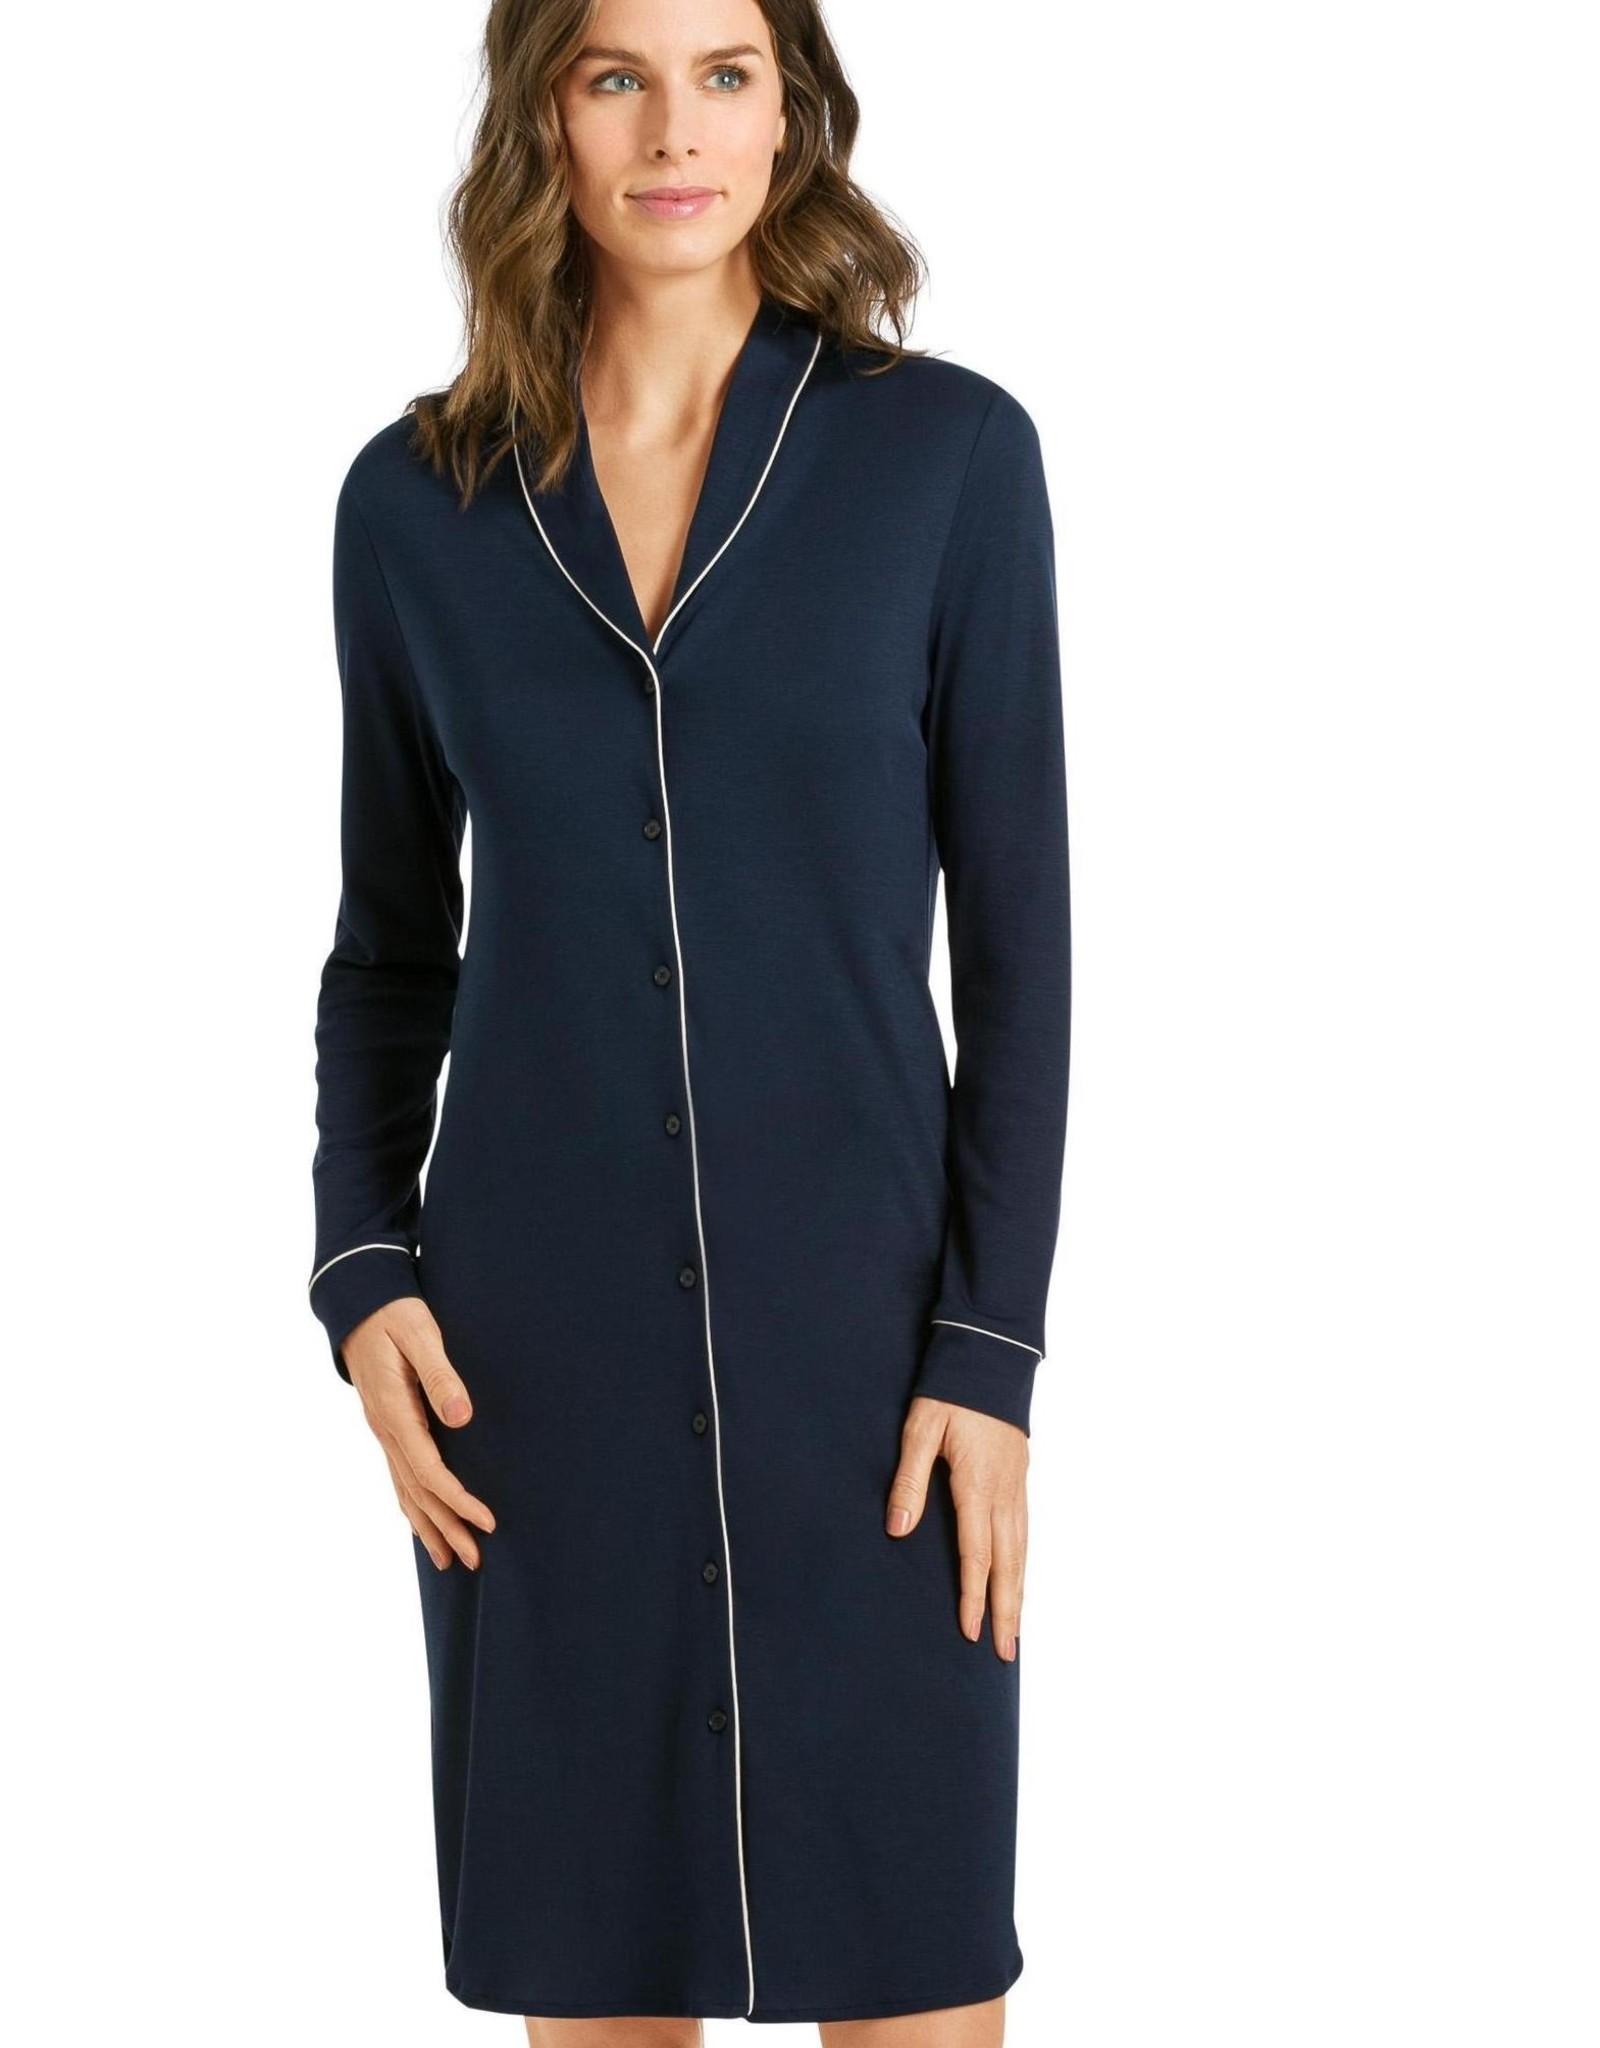 Hanro Natural Comfort Nightshirt